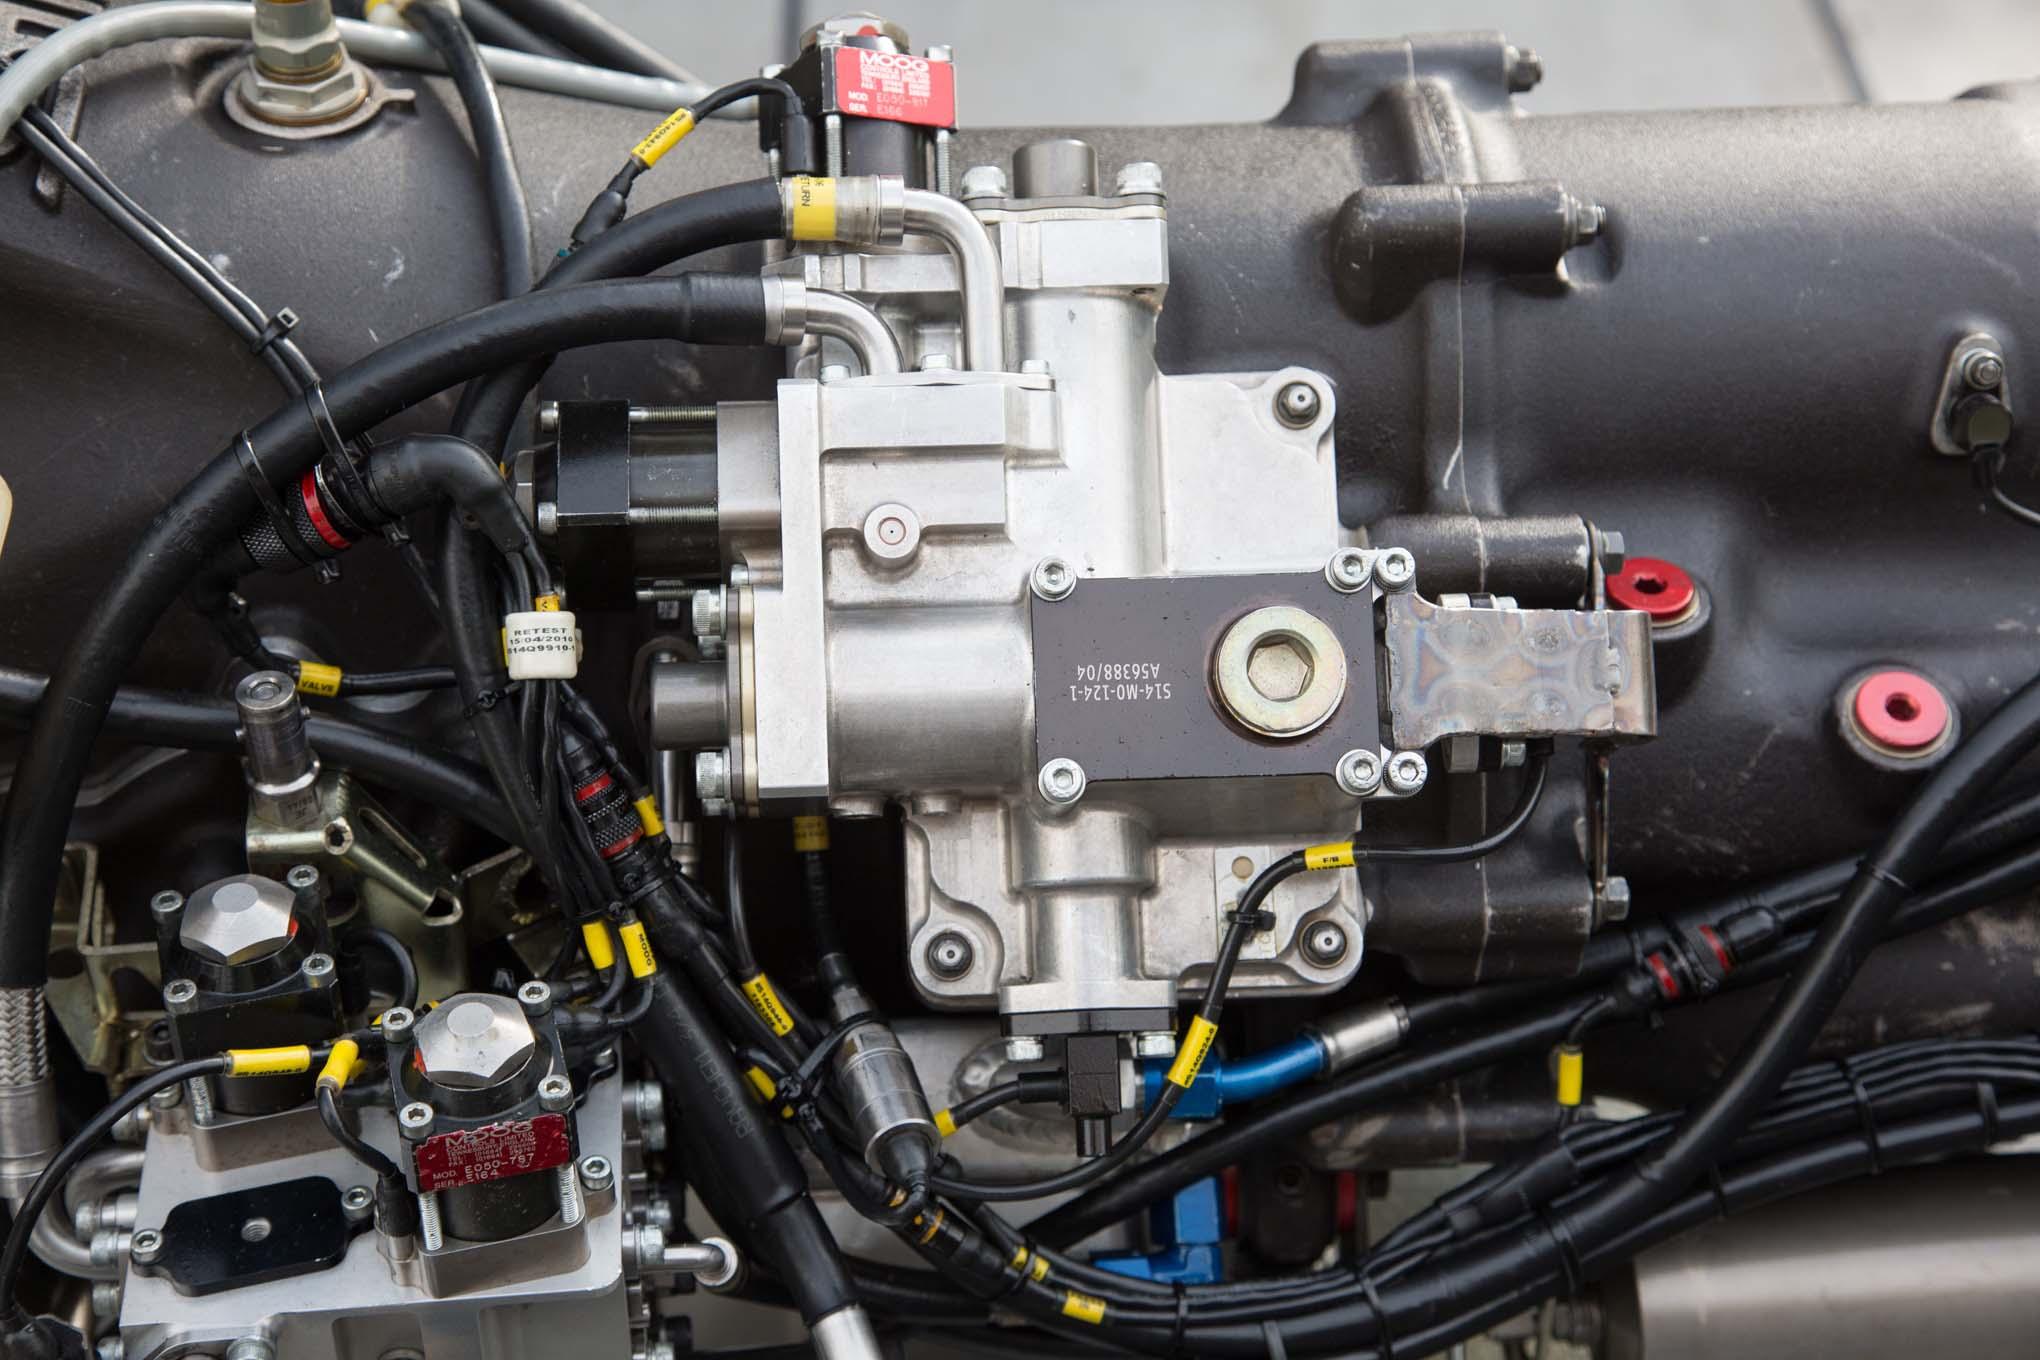 Engineering the world's fastest WRX — The Motorhood